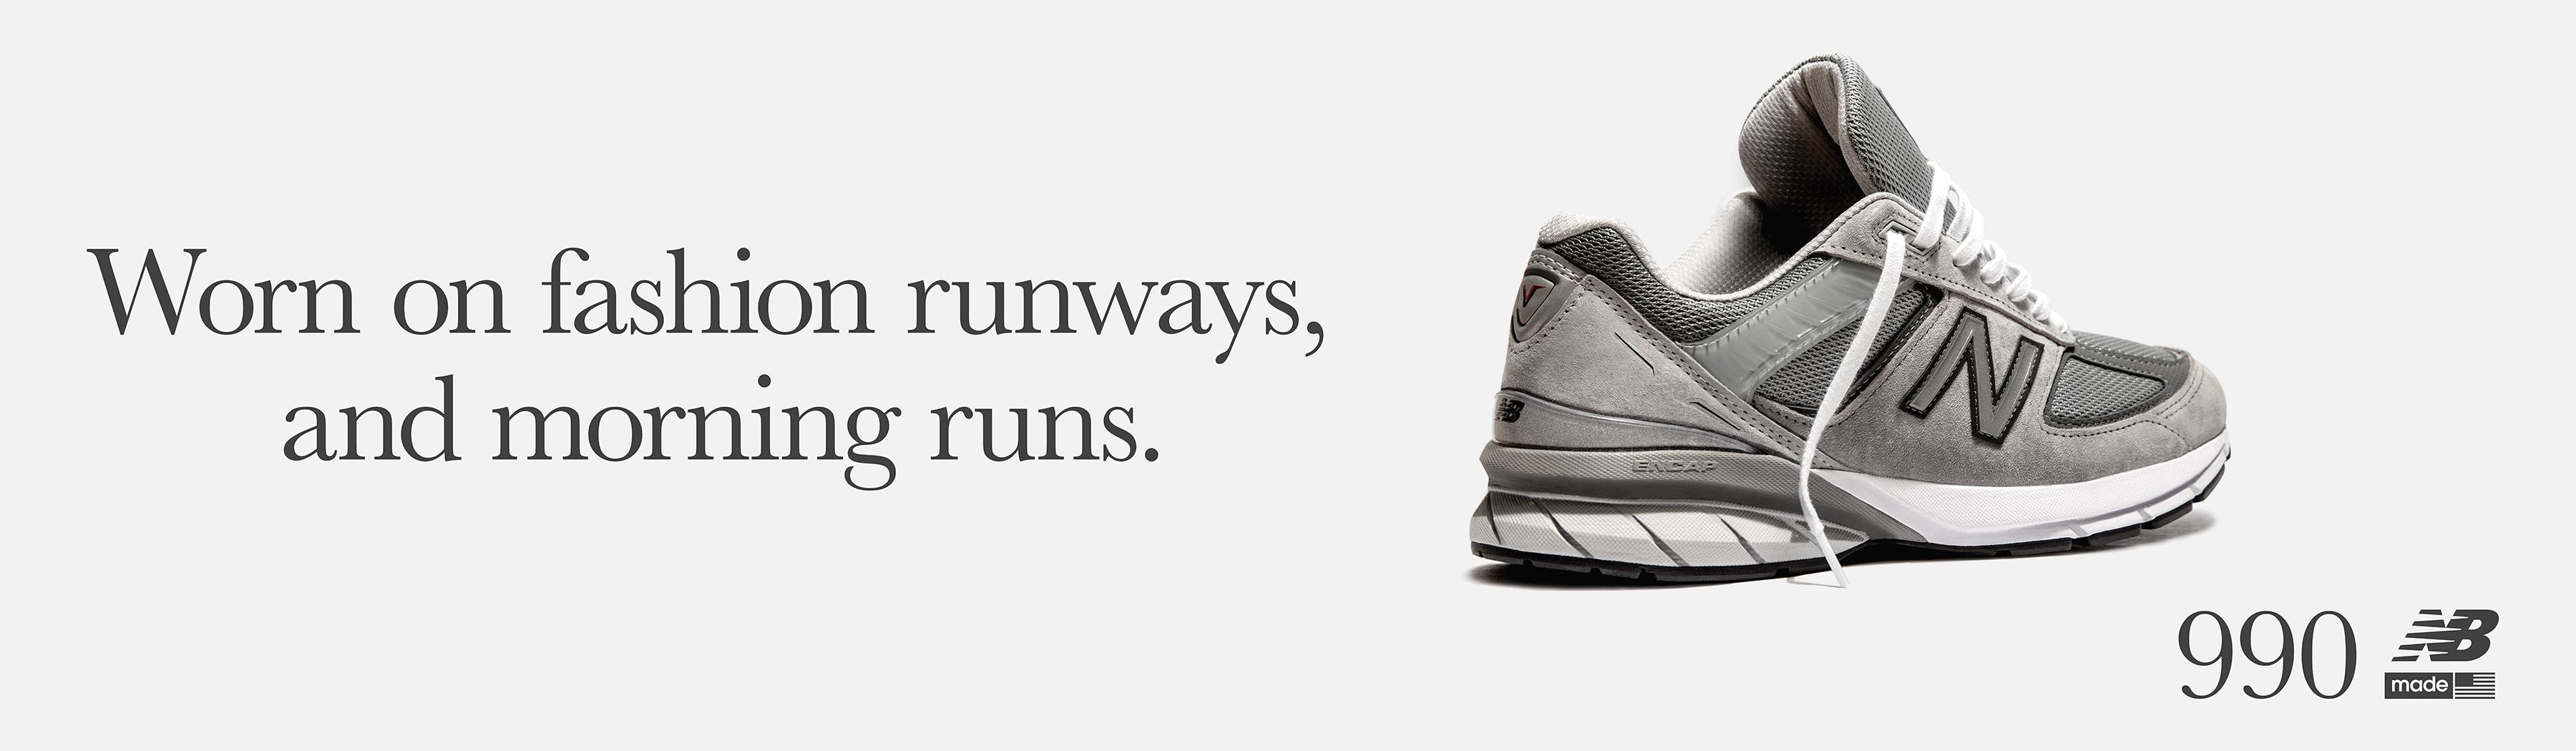 reputable site 4e35c 9553a New Balance Athletic Shoe, Inc. Home · MEN